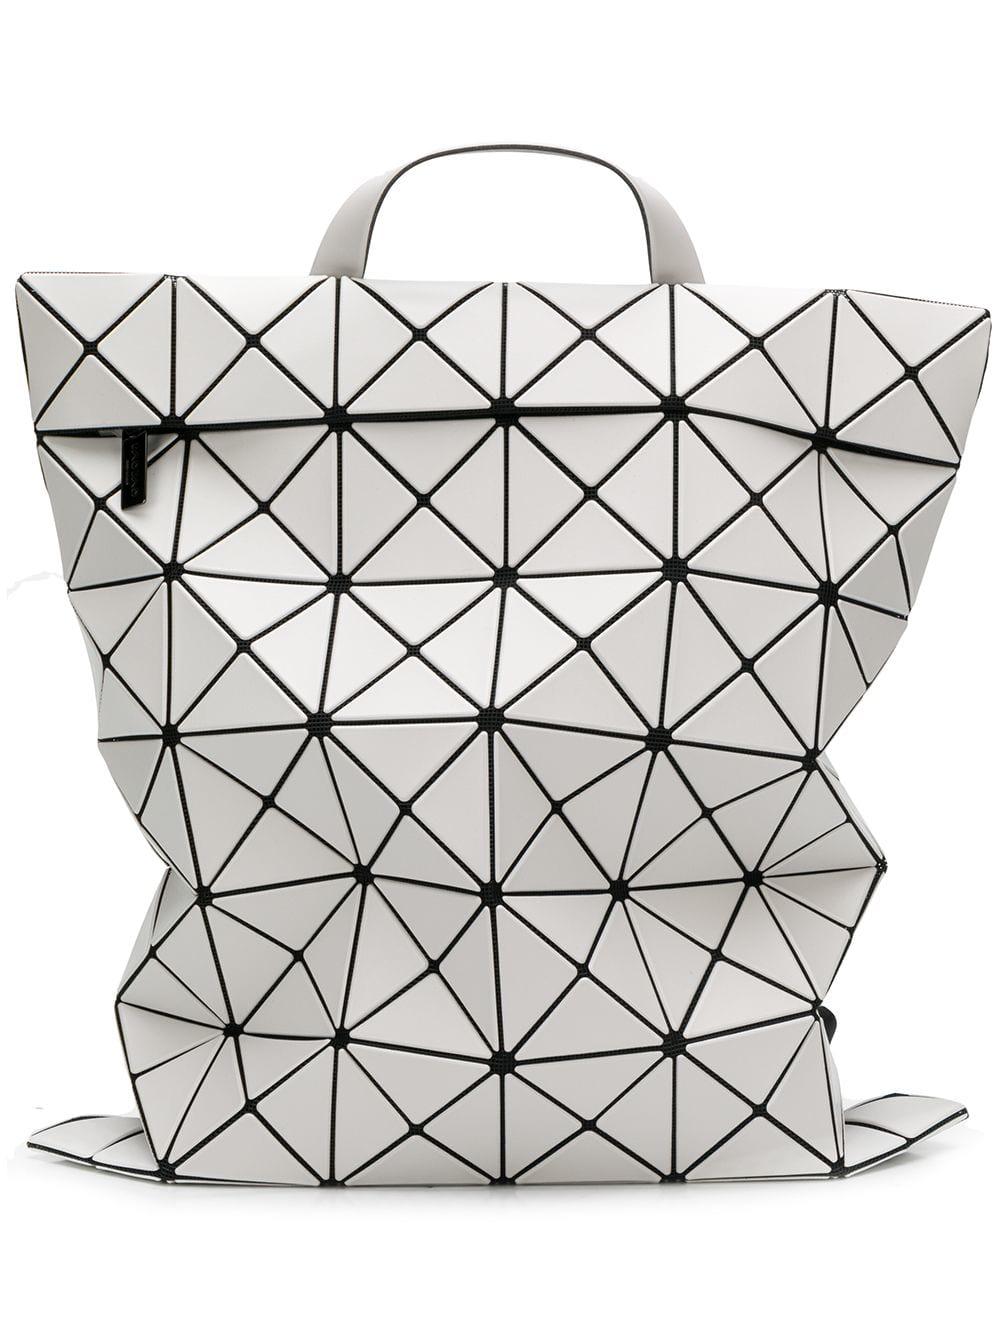 0ef36d90f3 BAO BAO ISSEY MIYAKE. Bao Bao Issey Miyake Geometric Panel ...